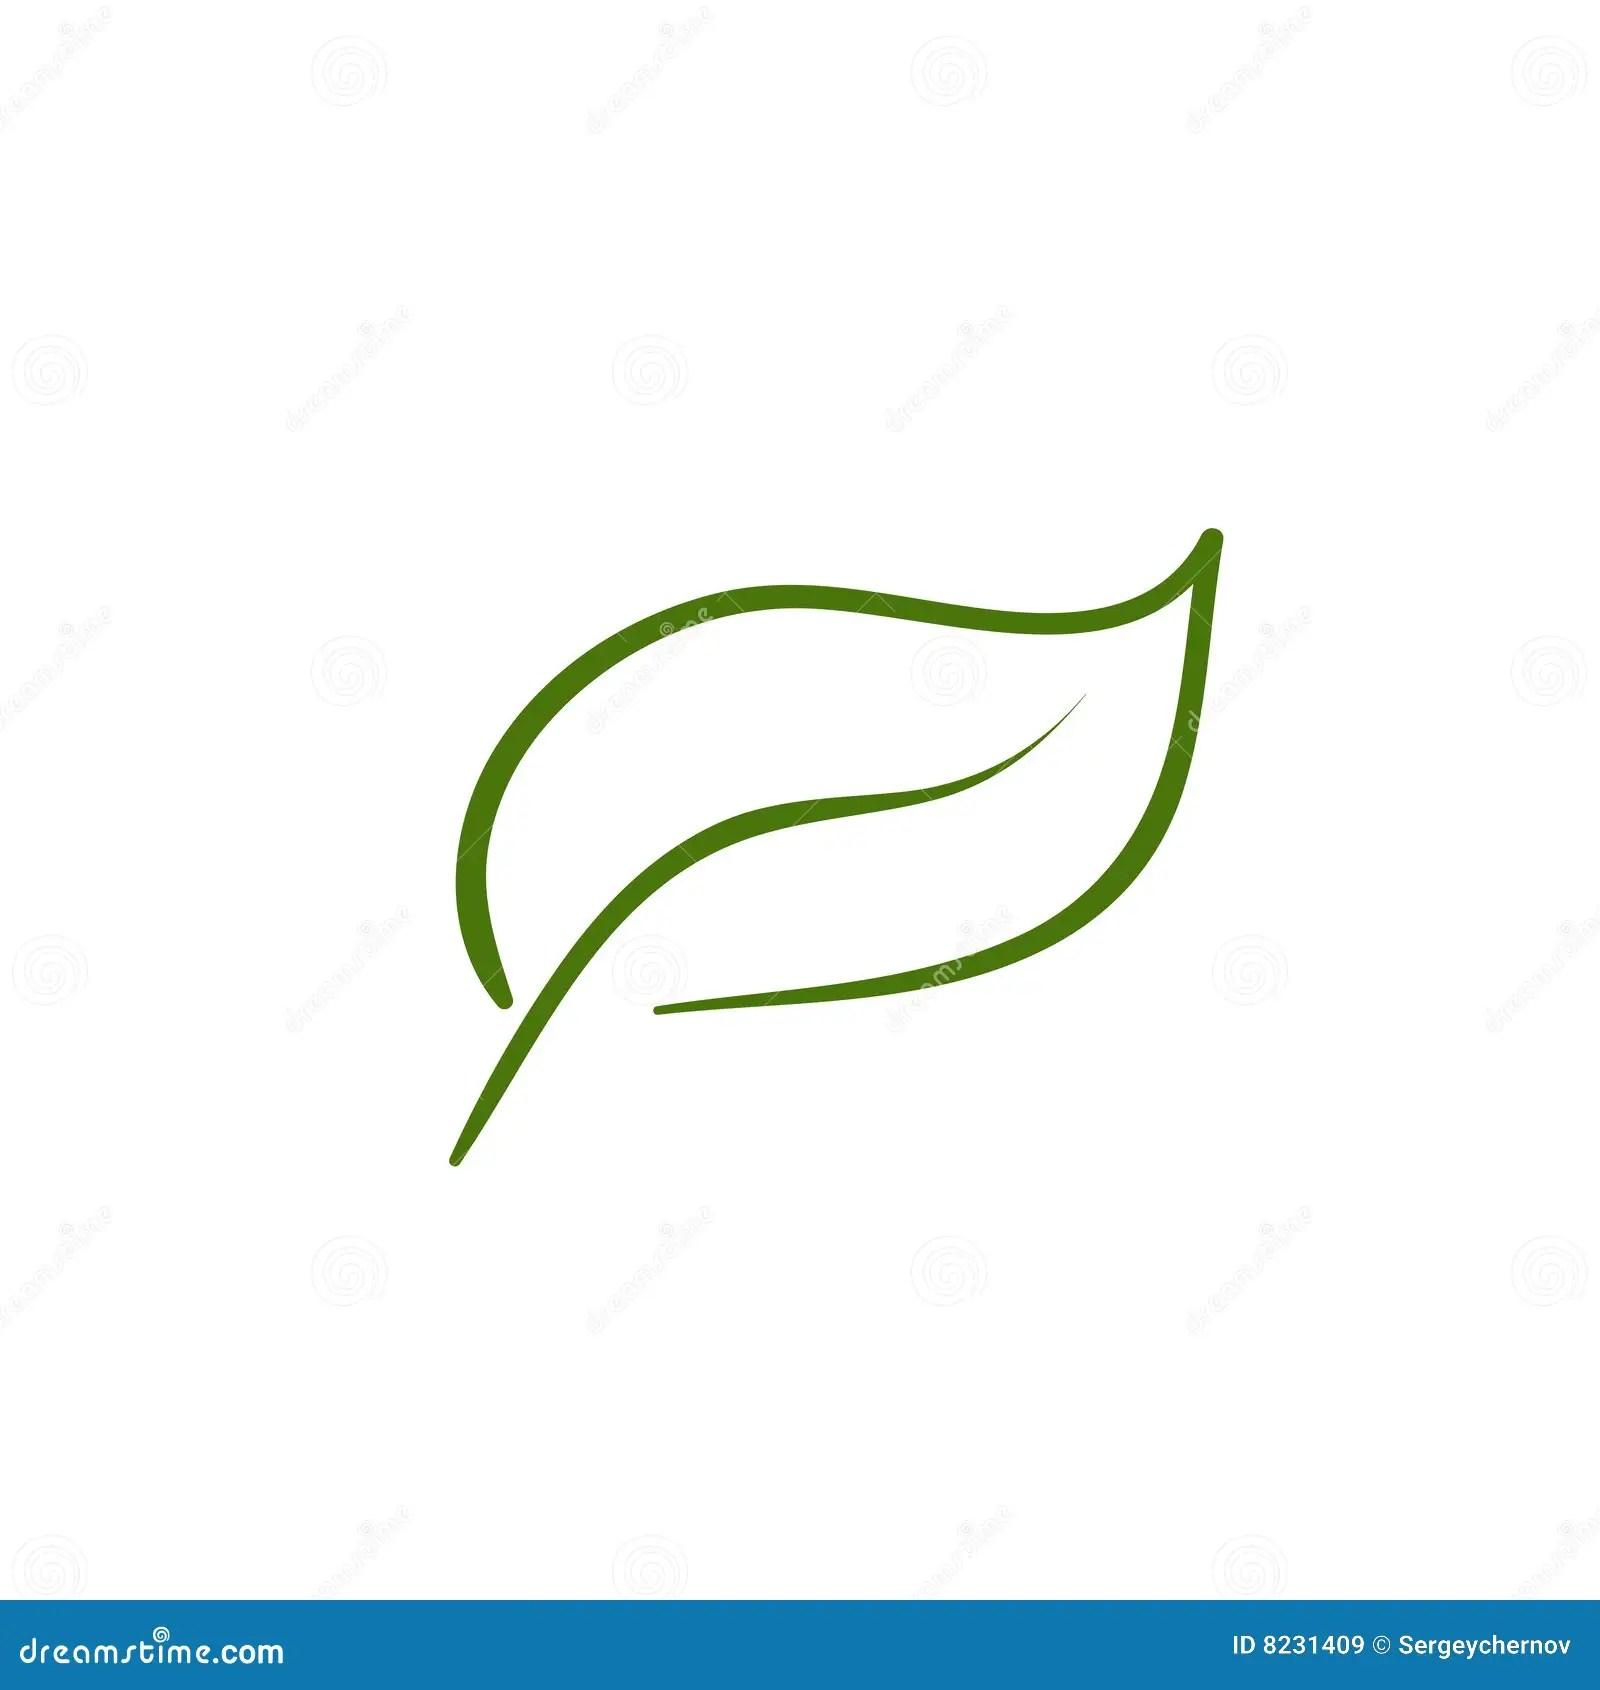 Leaf Artistic Line Royalty Free Stock Images